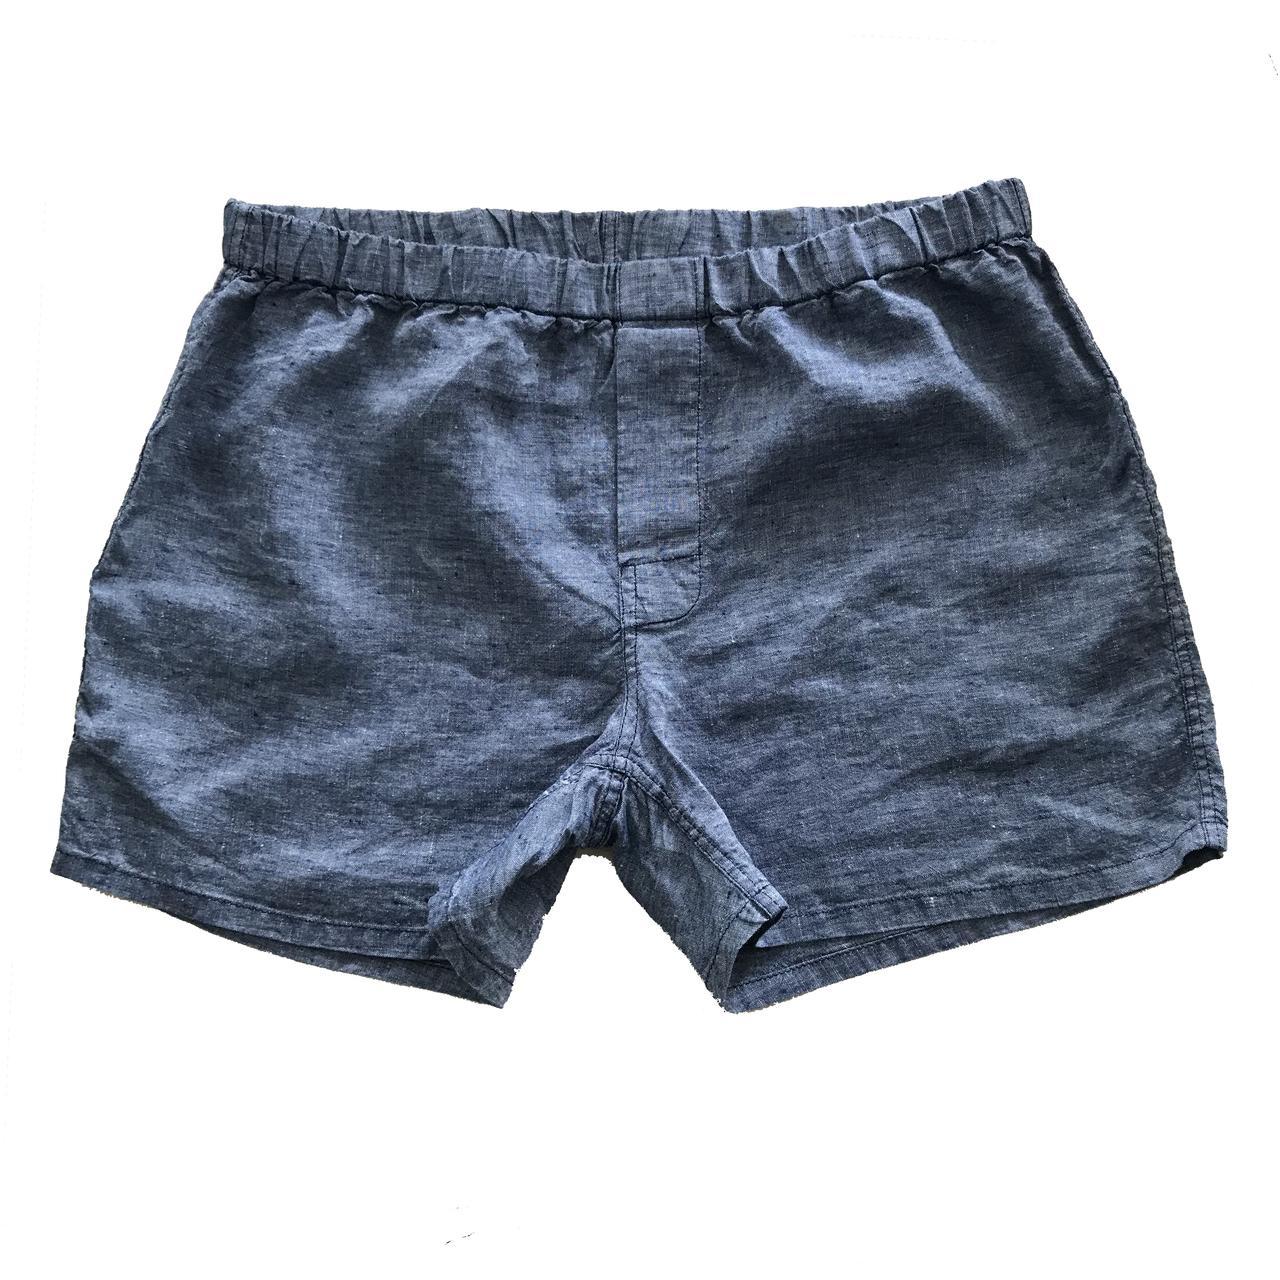 Linoto Linen Boxer Shorts, $34 @linoto.com